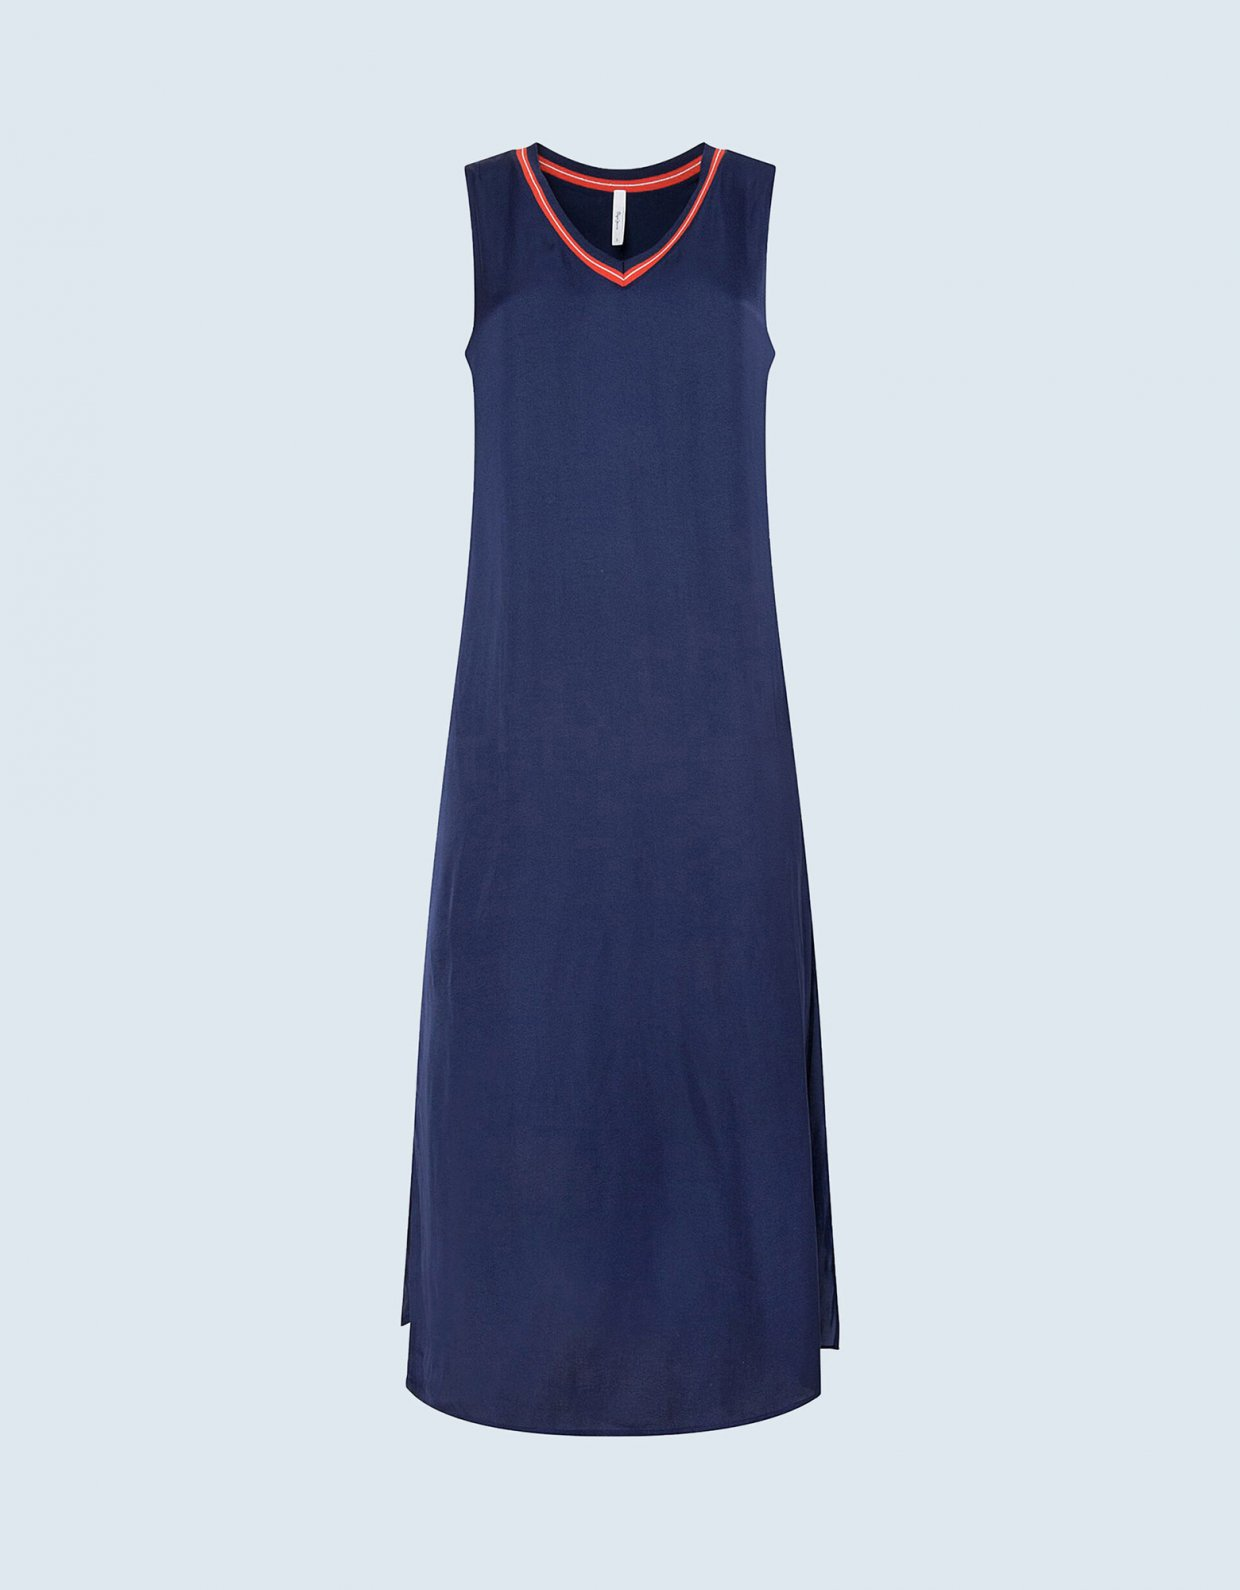 Pepe Jeans Idara dress